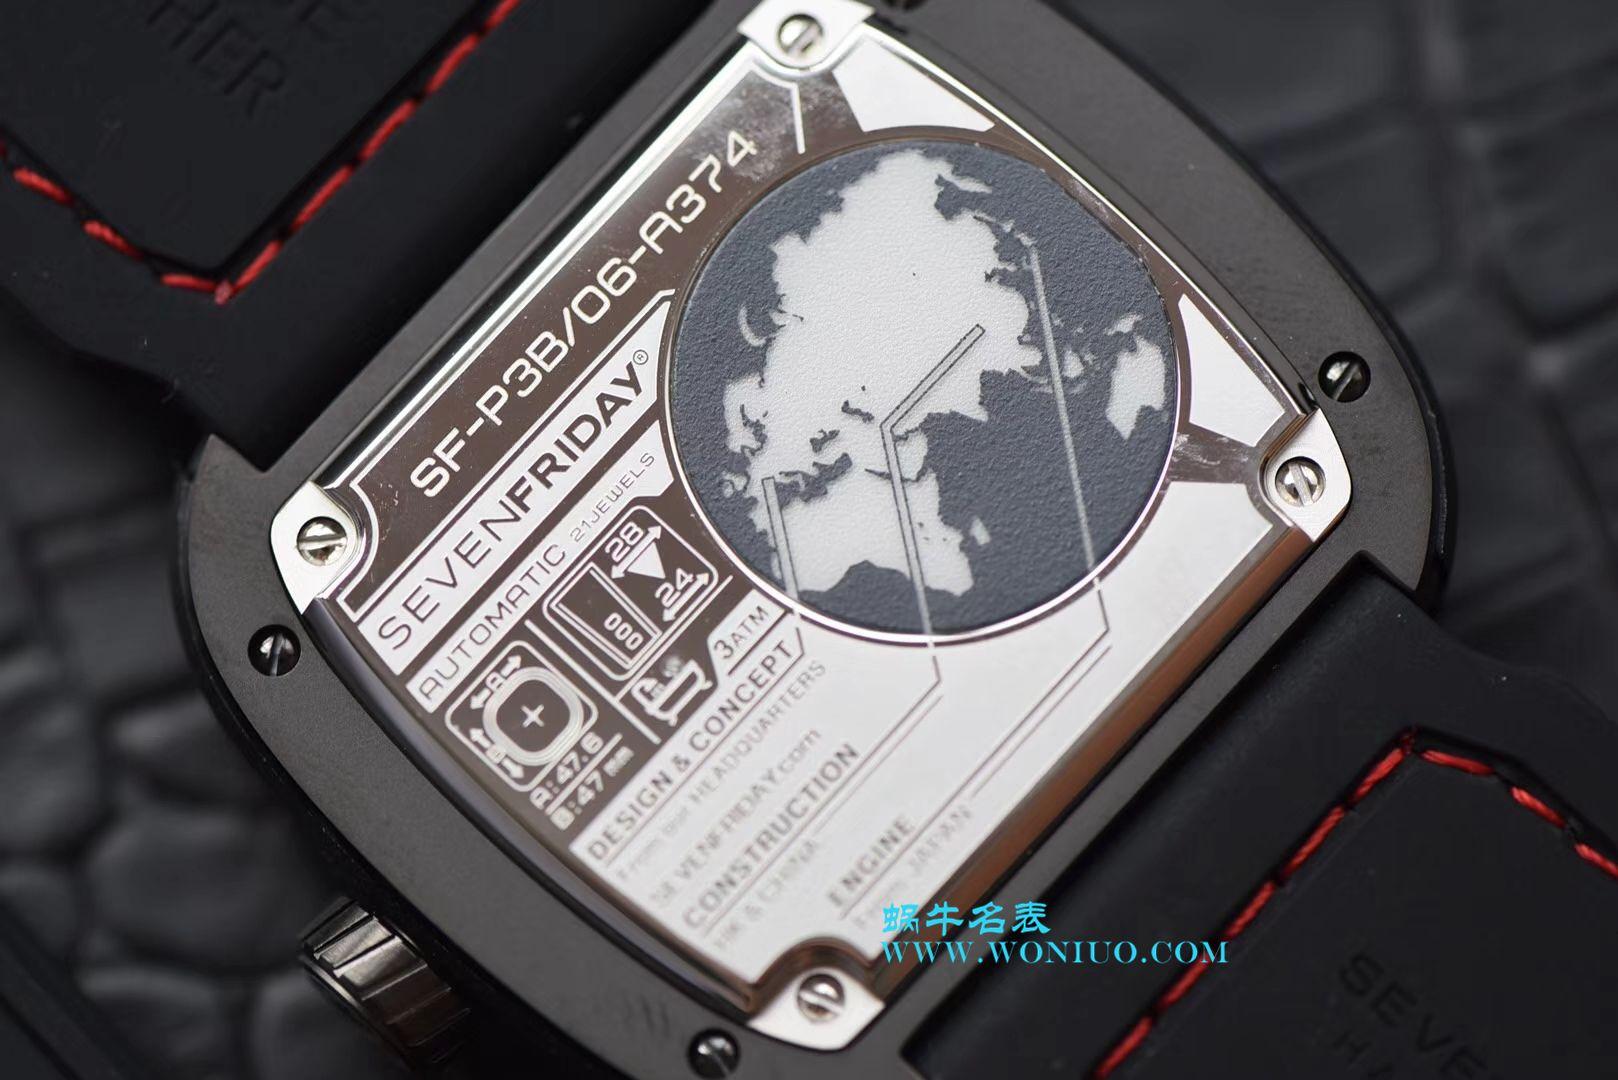 SV工厂出品顶级复刻顶级复刻七个星期五Sevenfriday手表集合 / SF032C